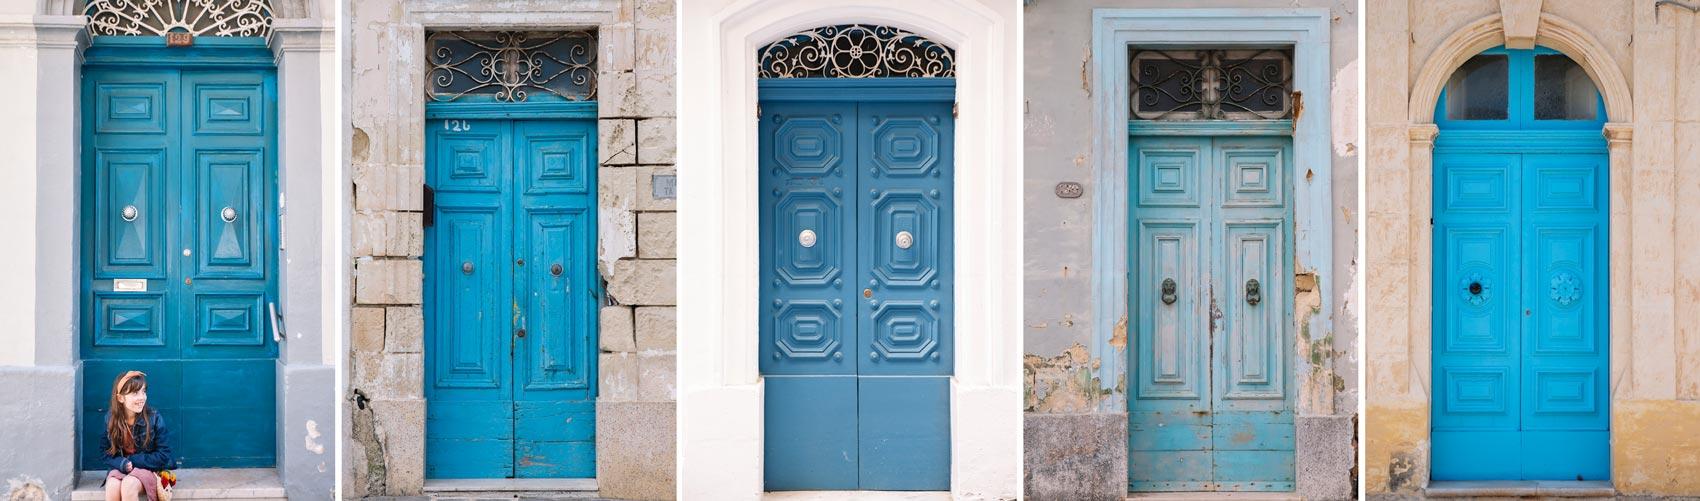 Puertas_malta